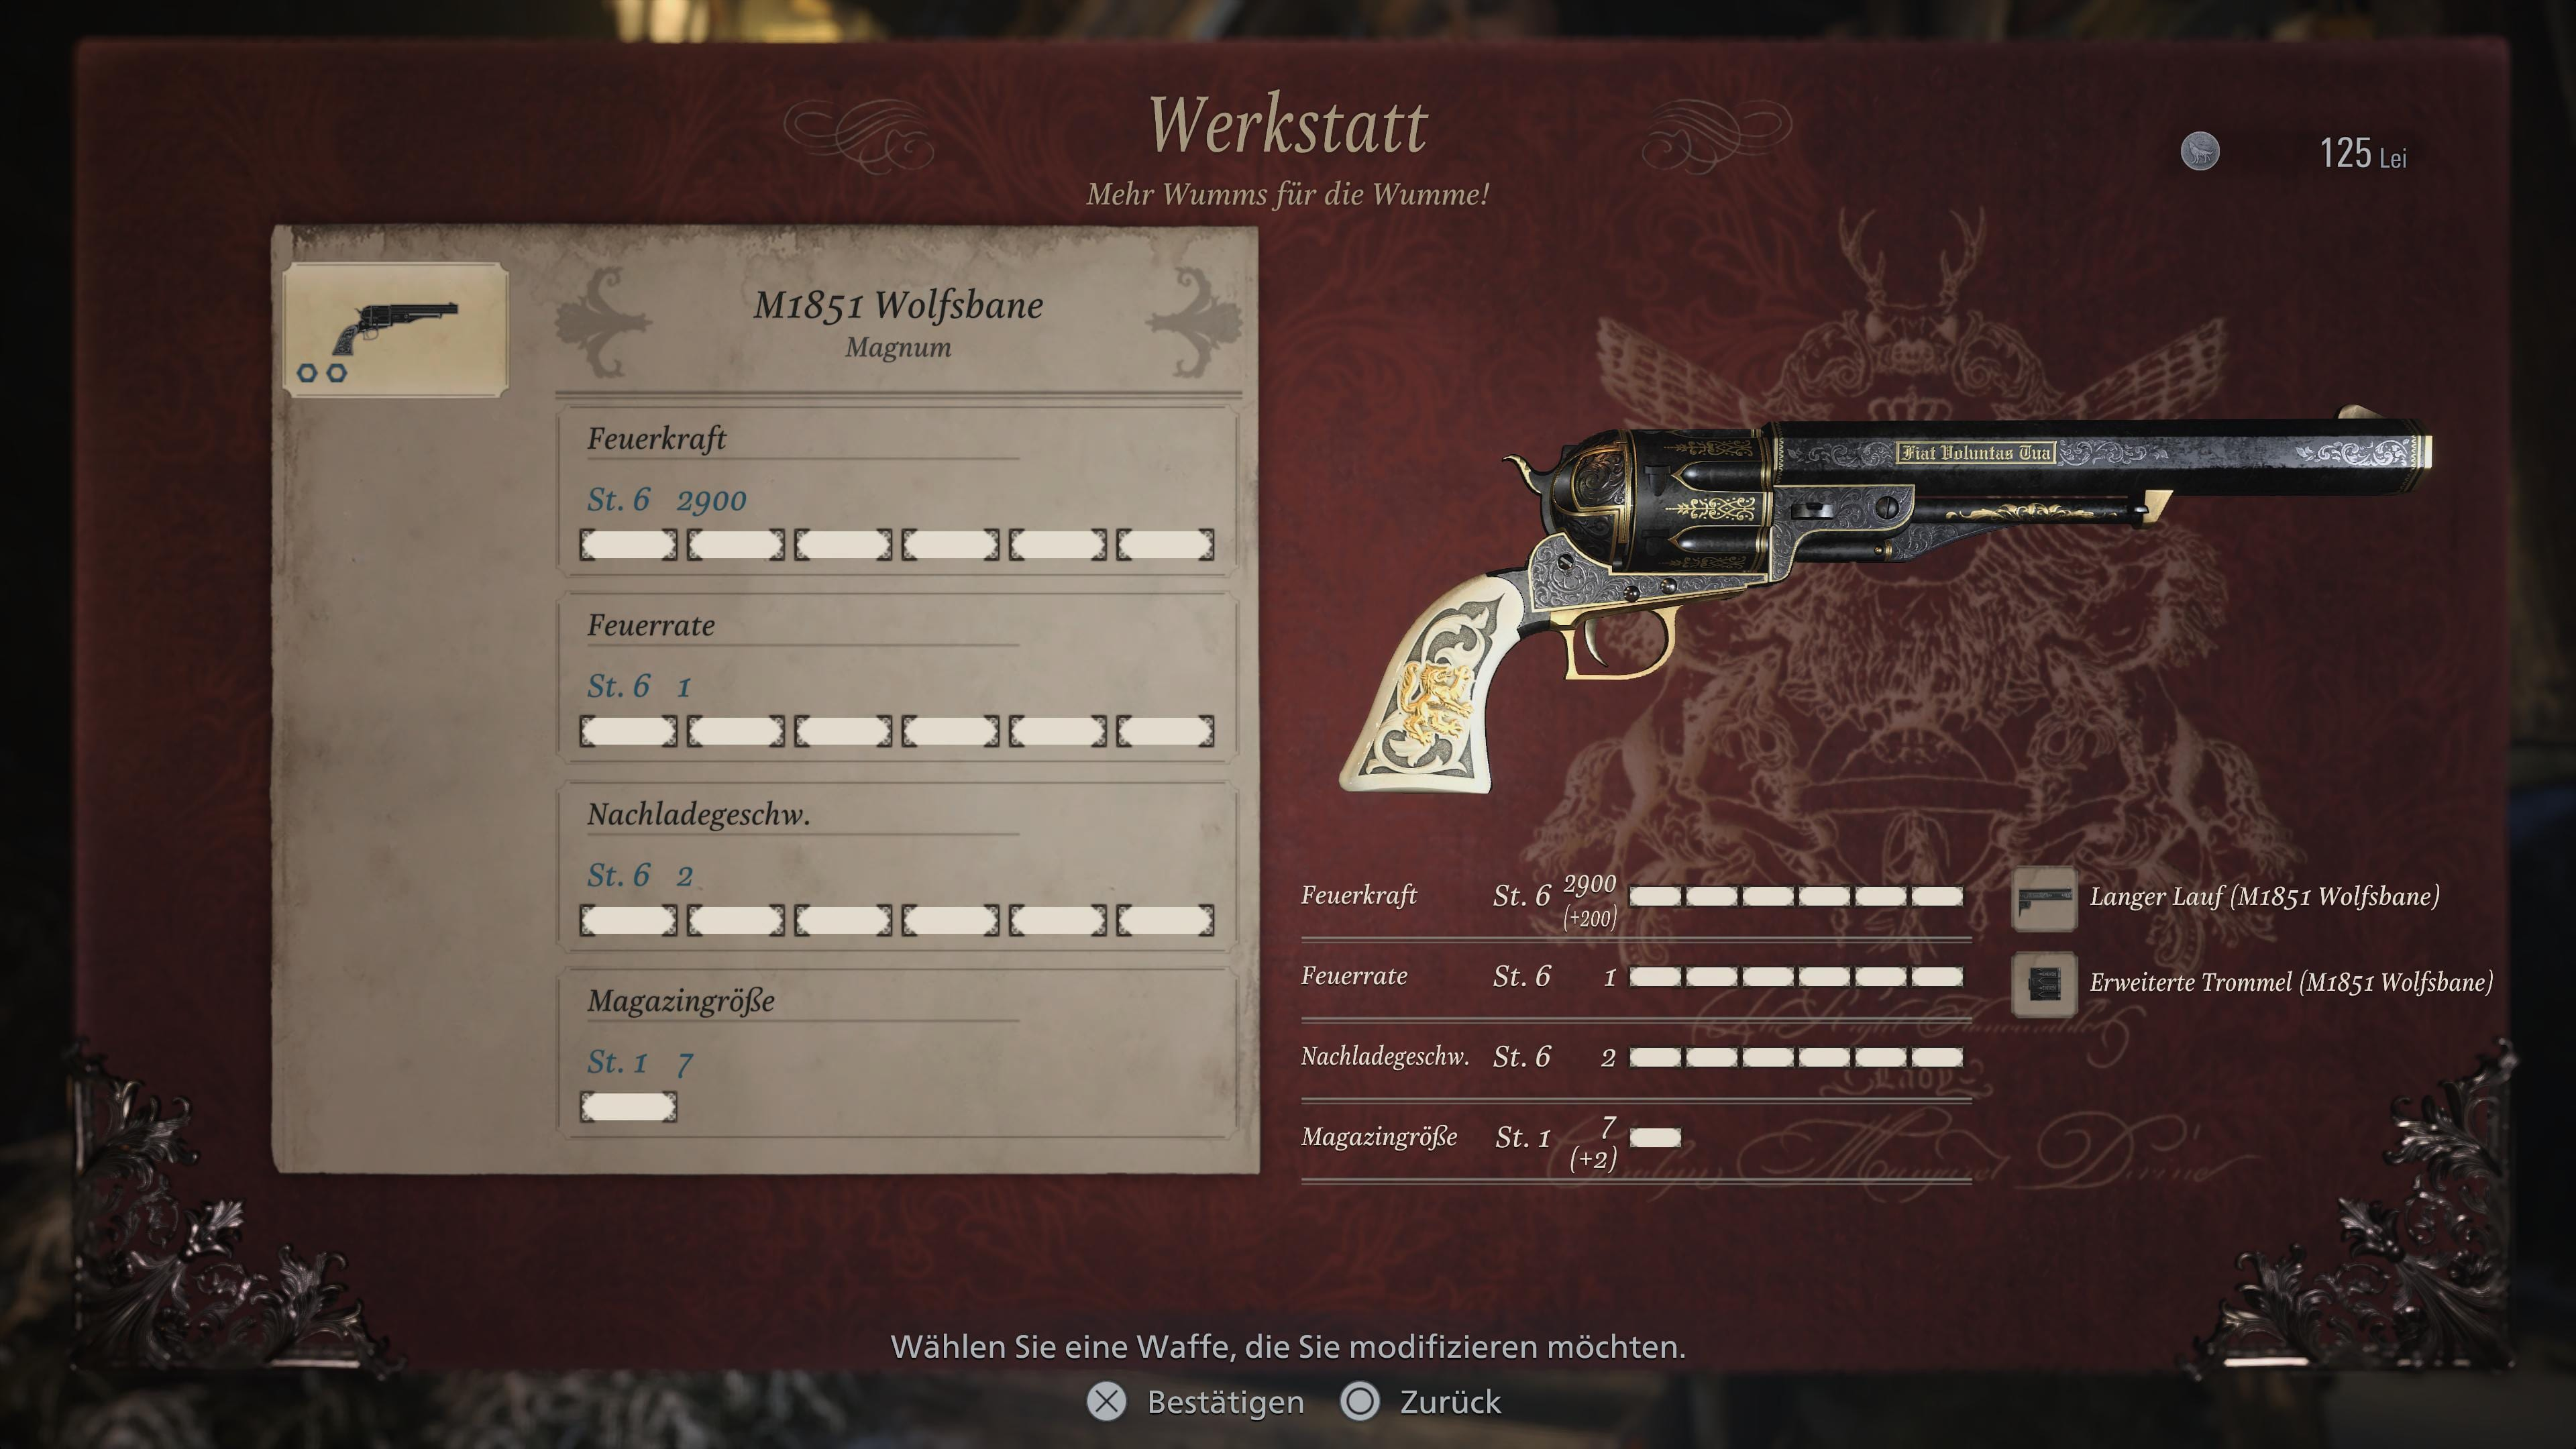 Valeurs de Resident Evil 8 Magnum Wolfsbane